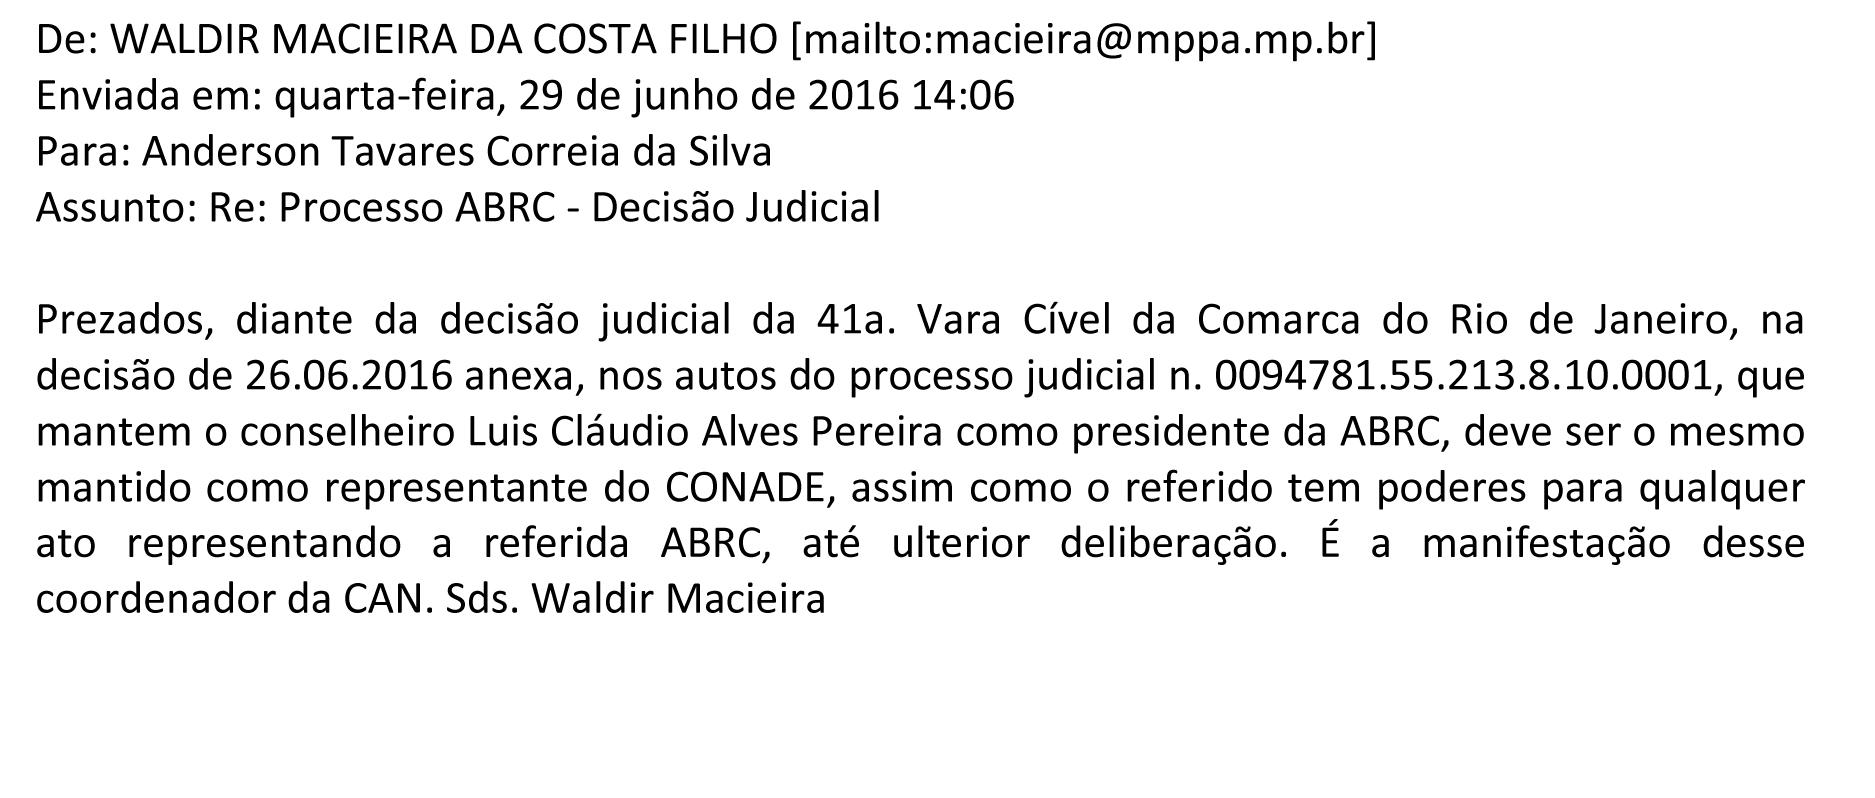 2016 06 29 Email Waldir Macieira